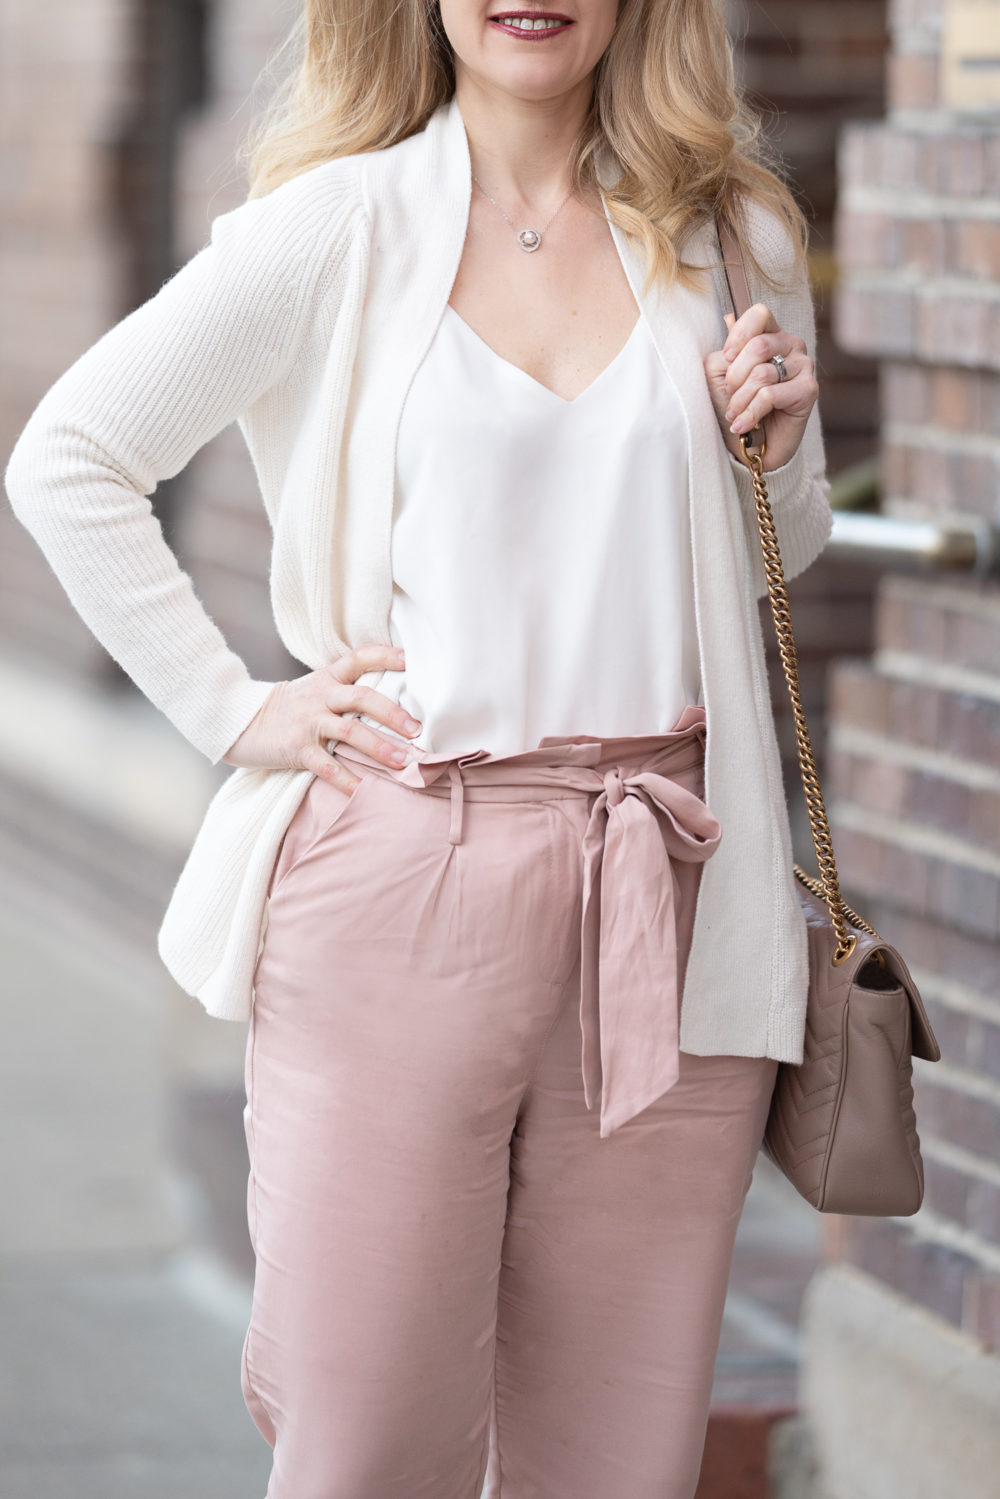 Petite Fashion Blog | Socialite Paper Bag Trousers | Loft Ribbed Cardigan | Gucci Marmont Shoulder Bag